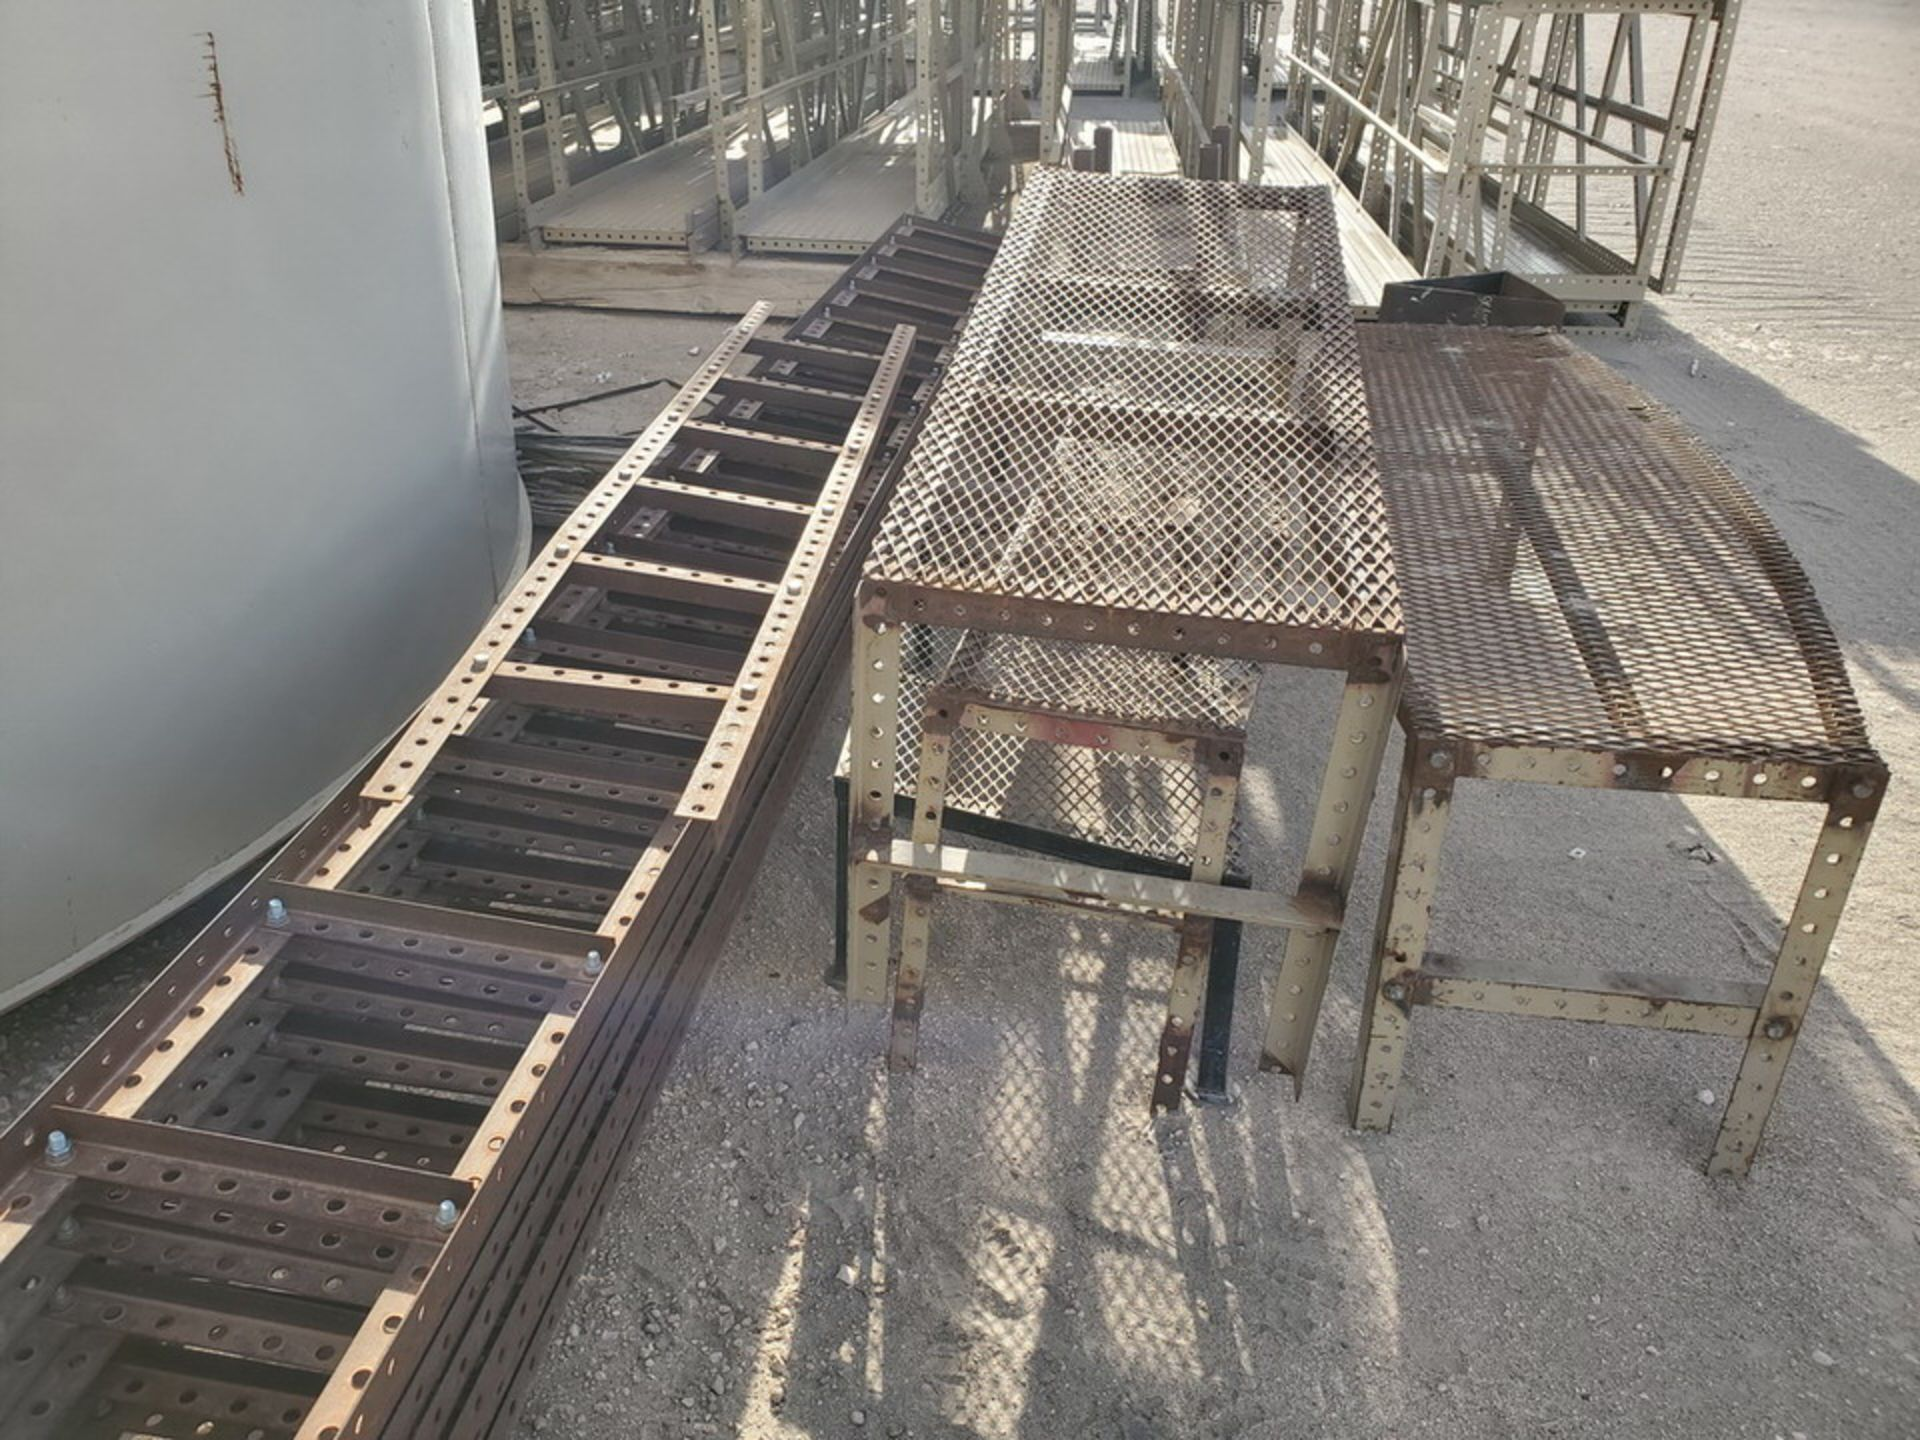 "Assorted Stl Matl. Racks & Ladders Size Range: 30"" x 26"" x 25""H - 29"" x 48"" x 50""H - Image 10 of 18"